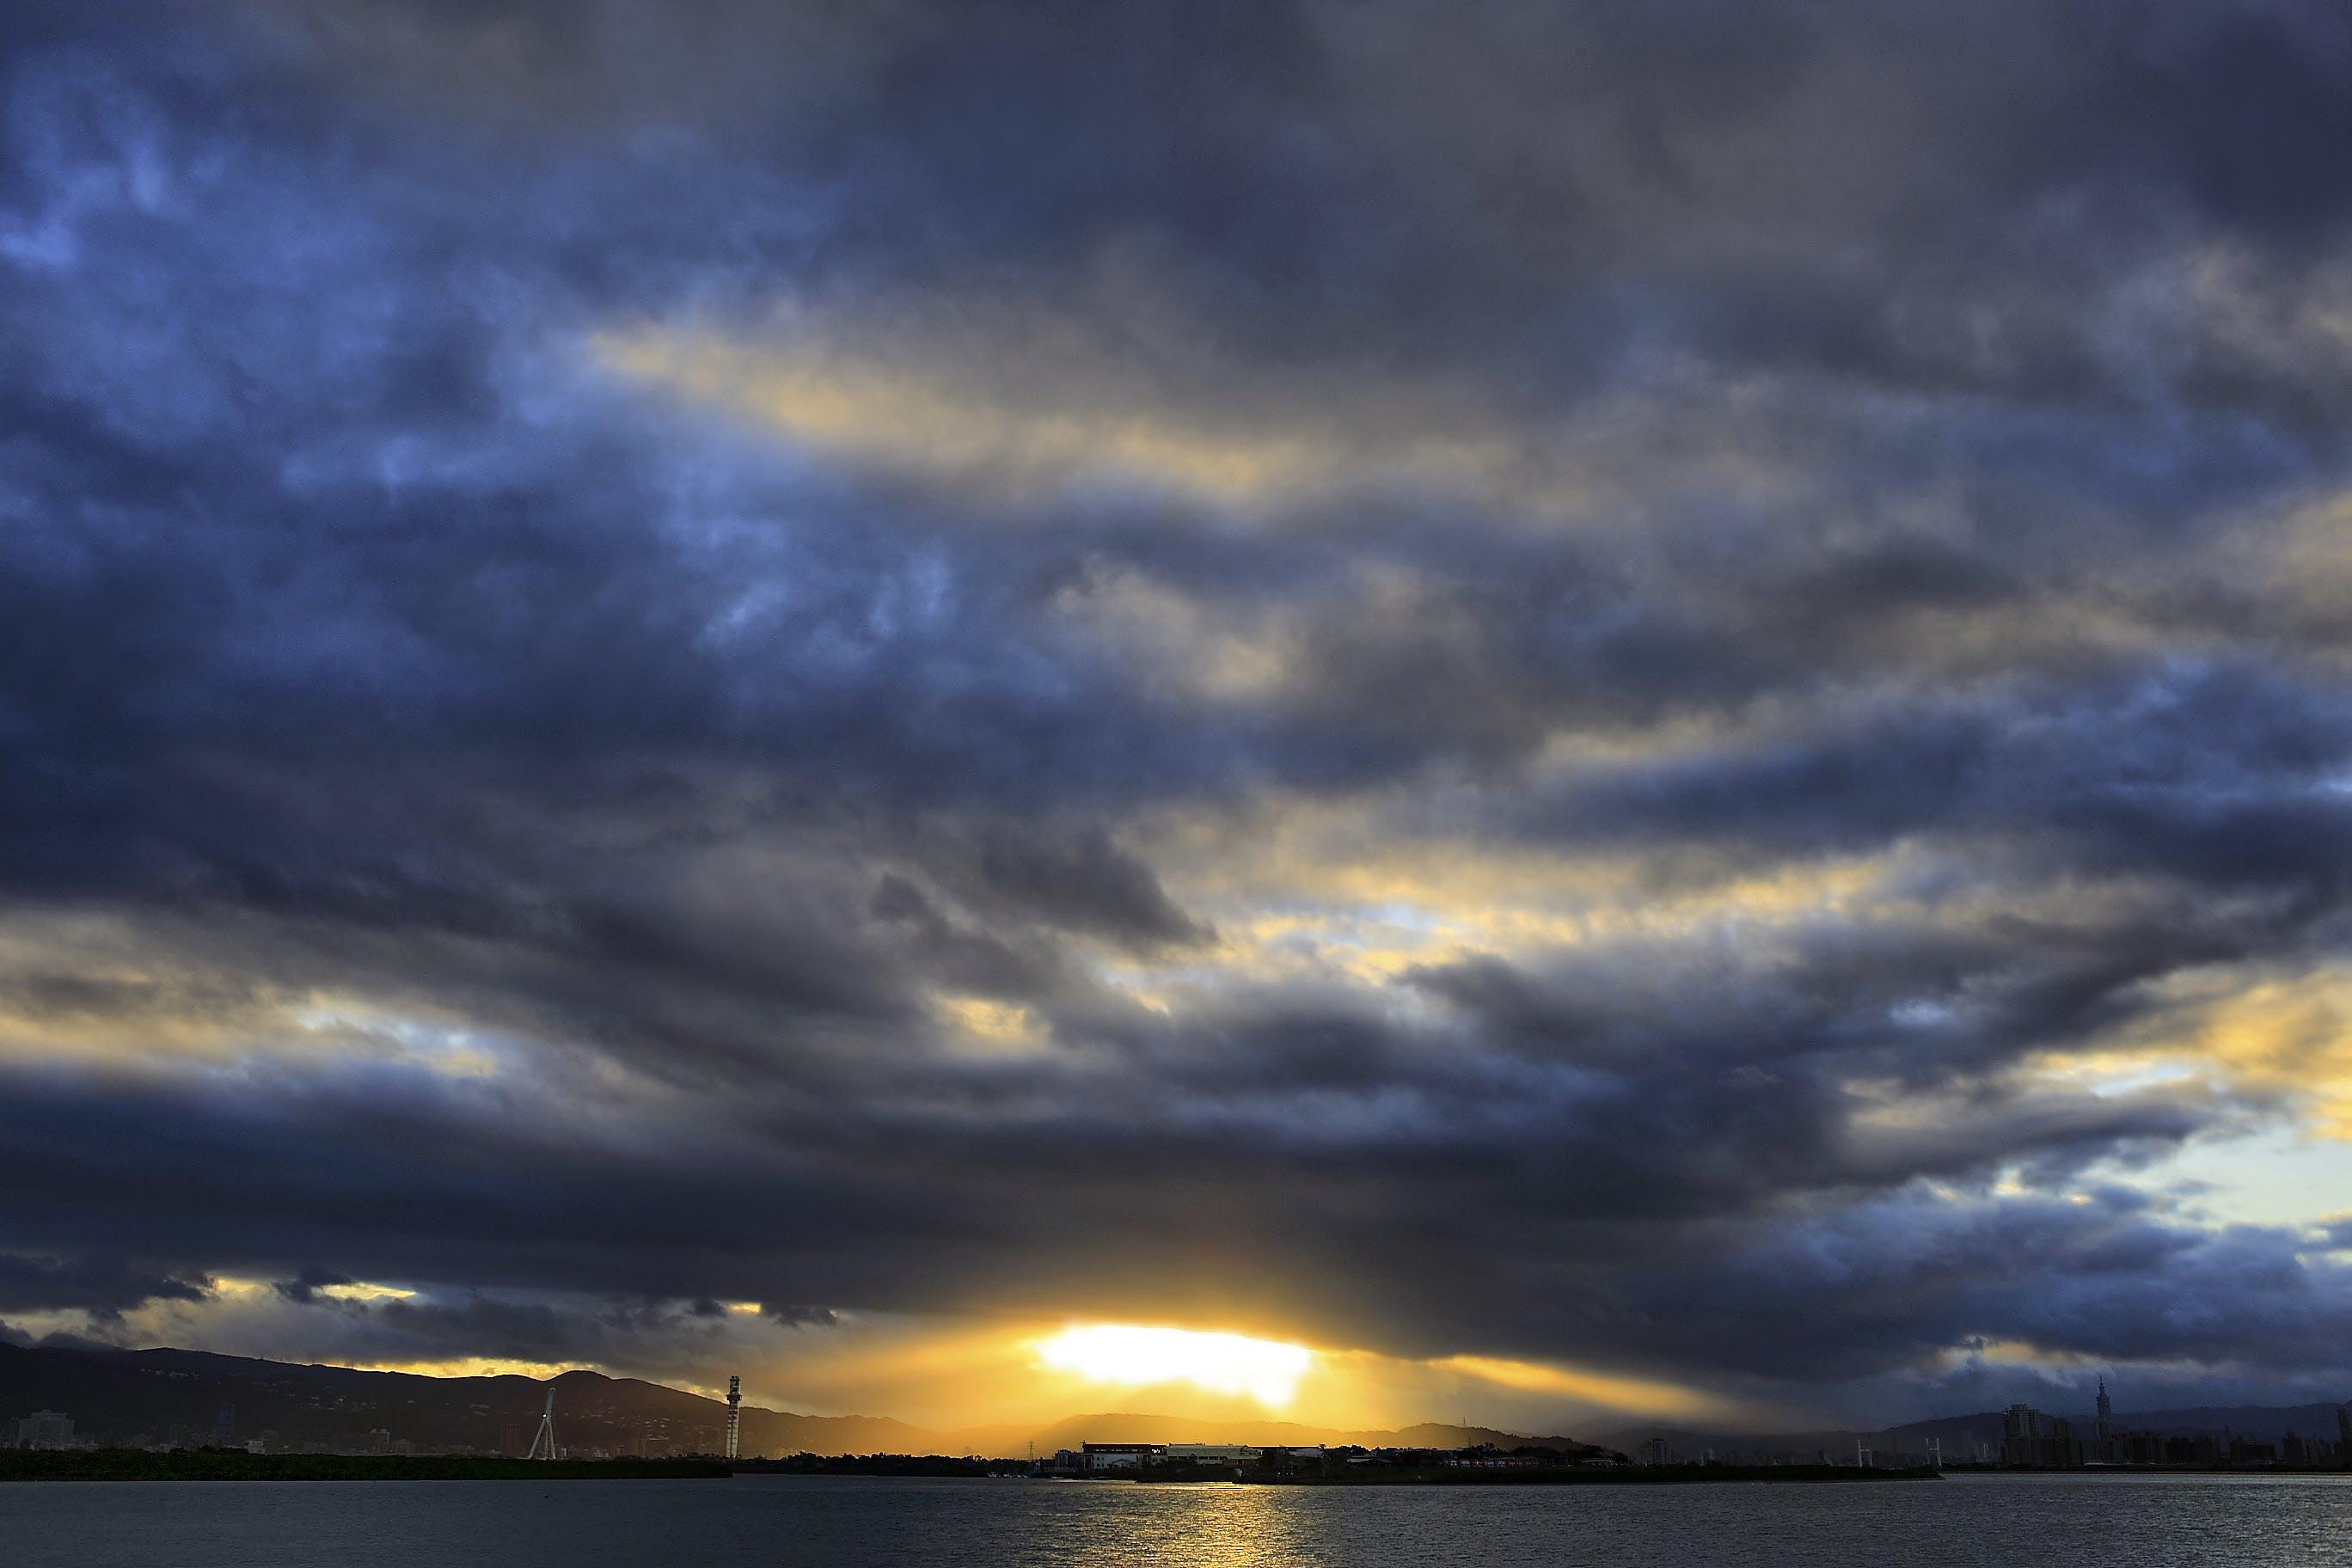 Nimbus Clouds at Sunset View